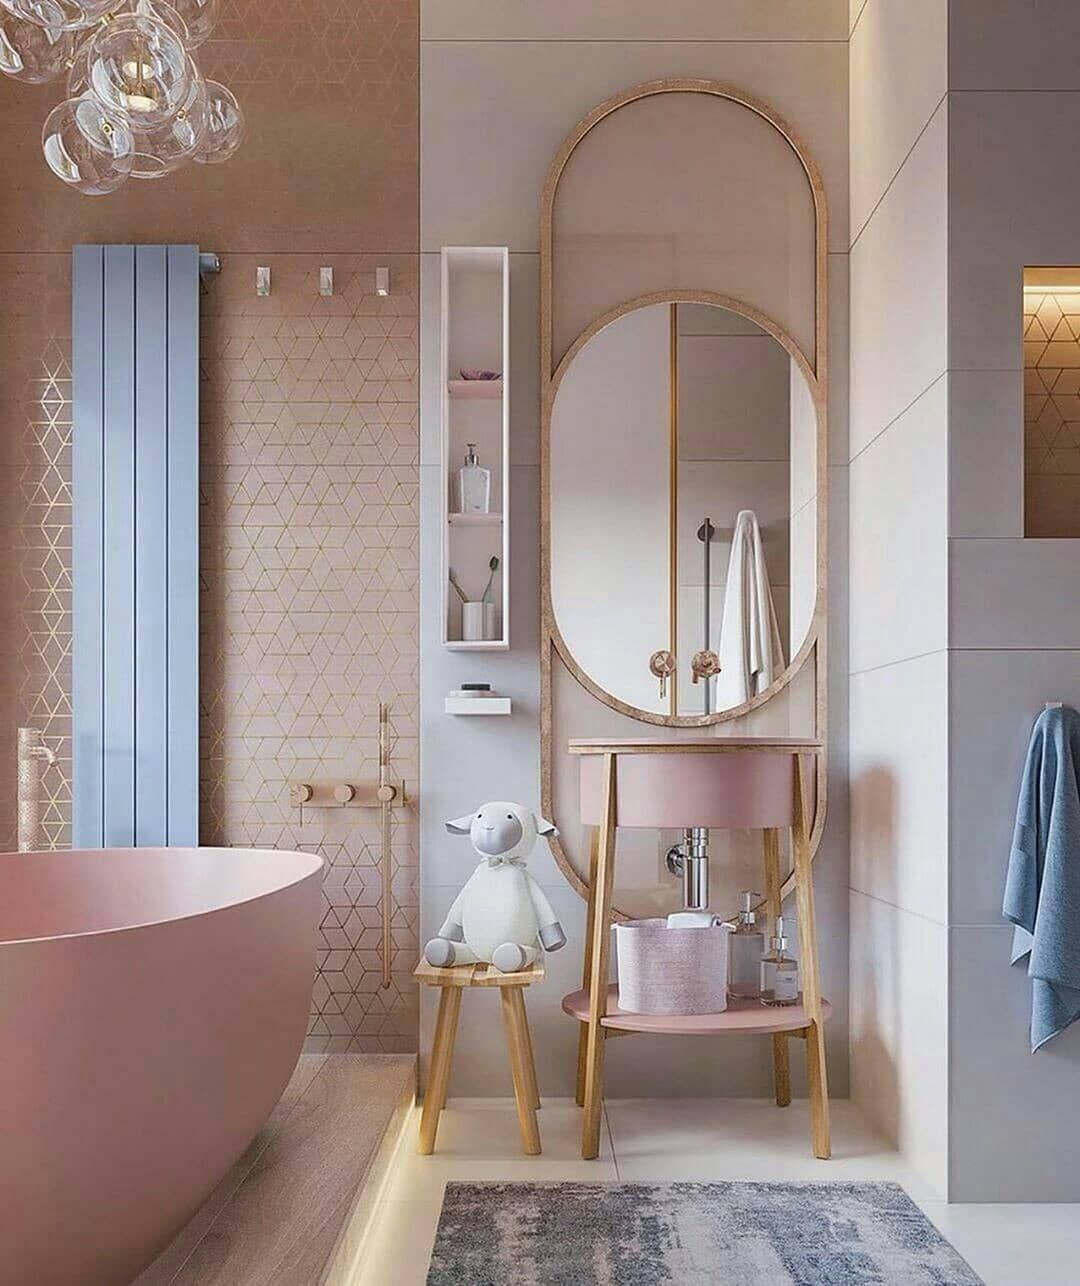 Pin De Paola Guzman Em دورات مياه مودرن Banheiros Modernos Banheiros Luxuosos Design De Casa